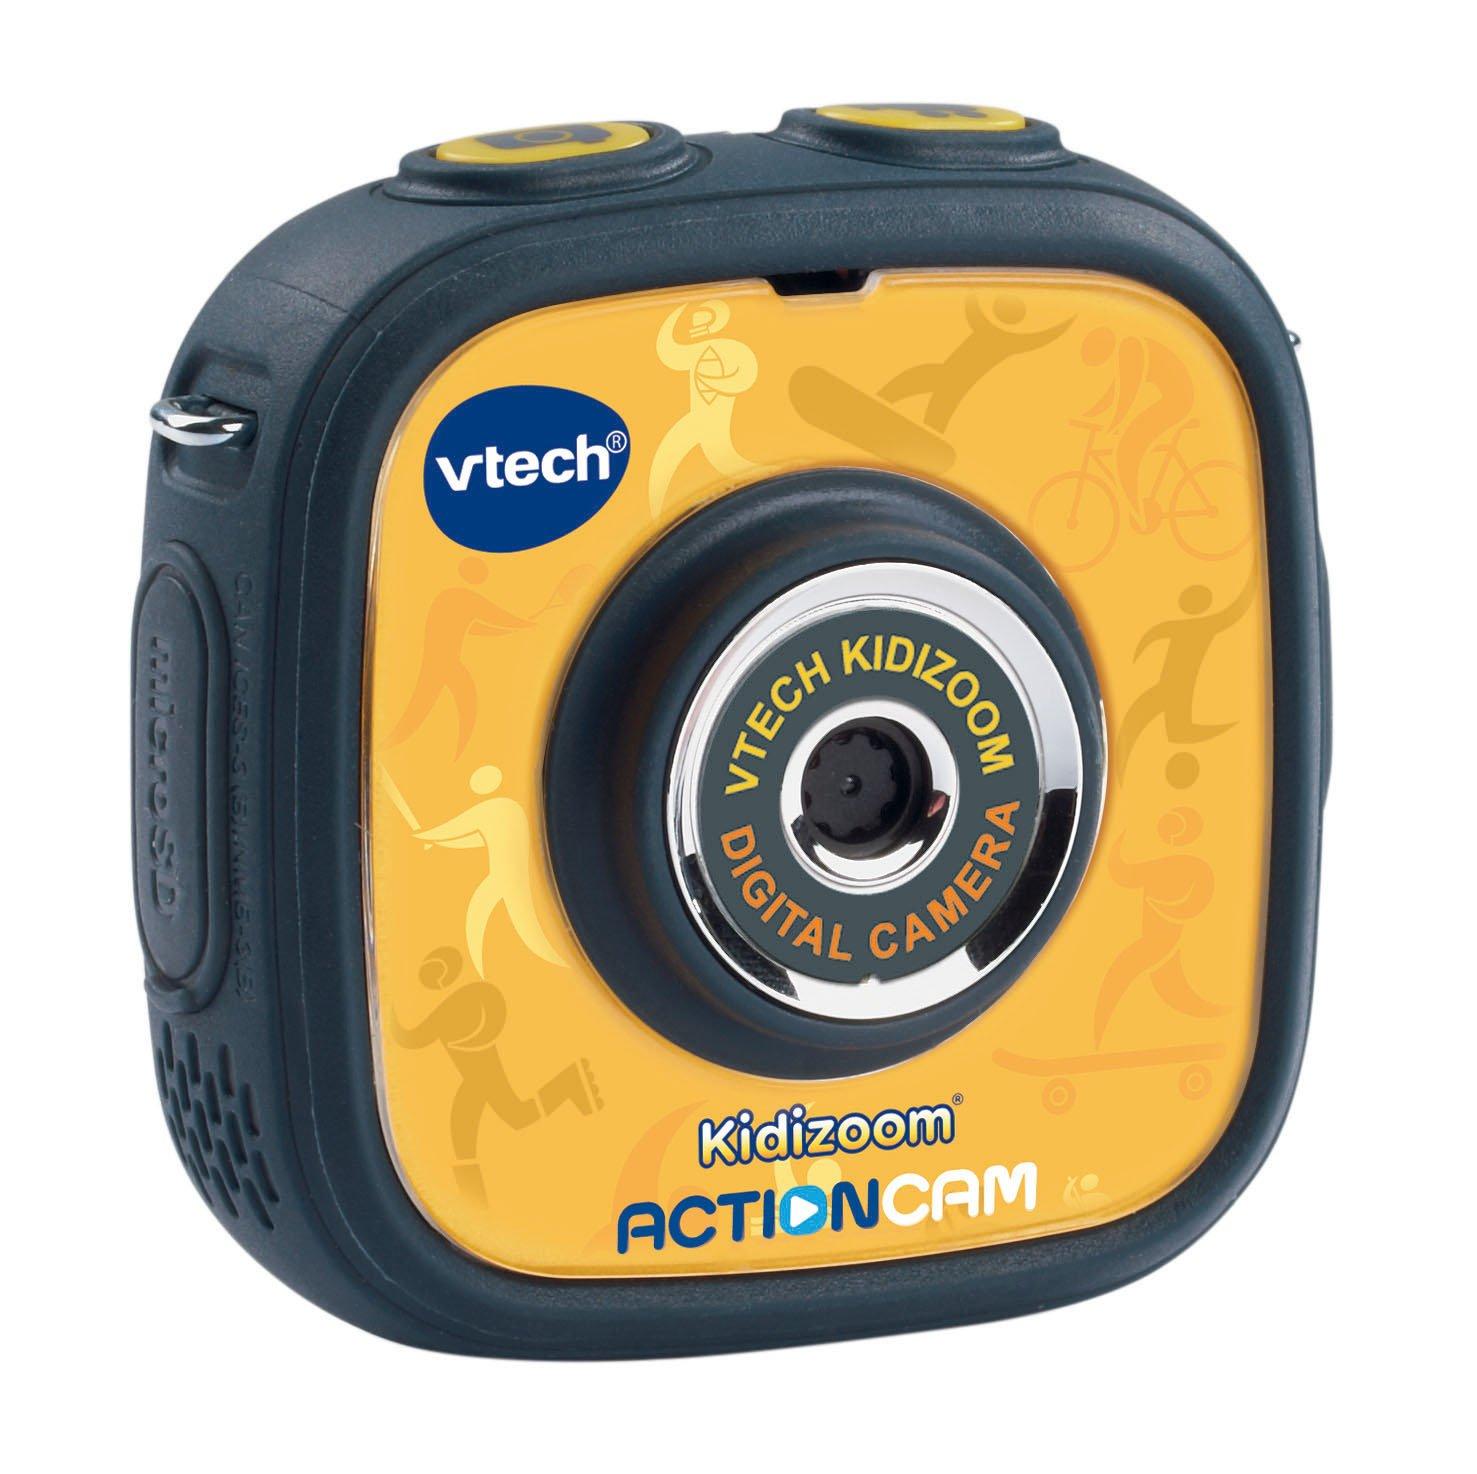 VTech 80-170704 – Kidizoom Action Cam günstig bestellen